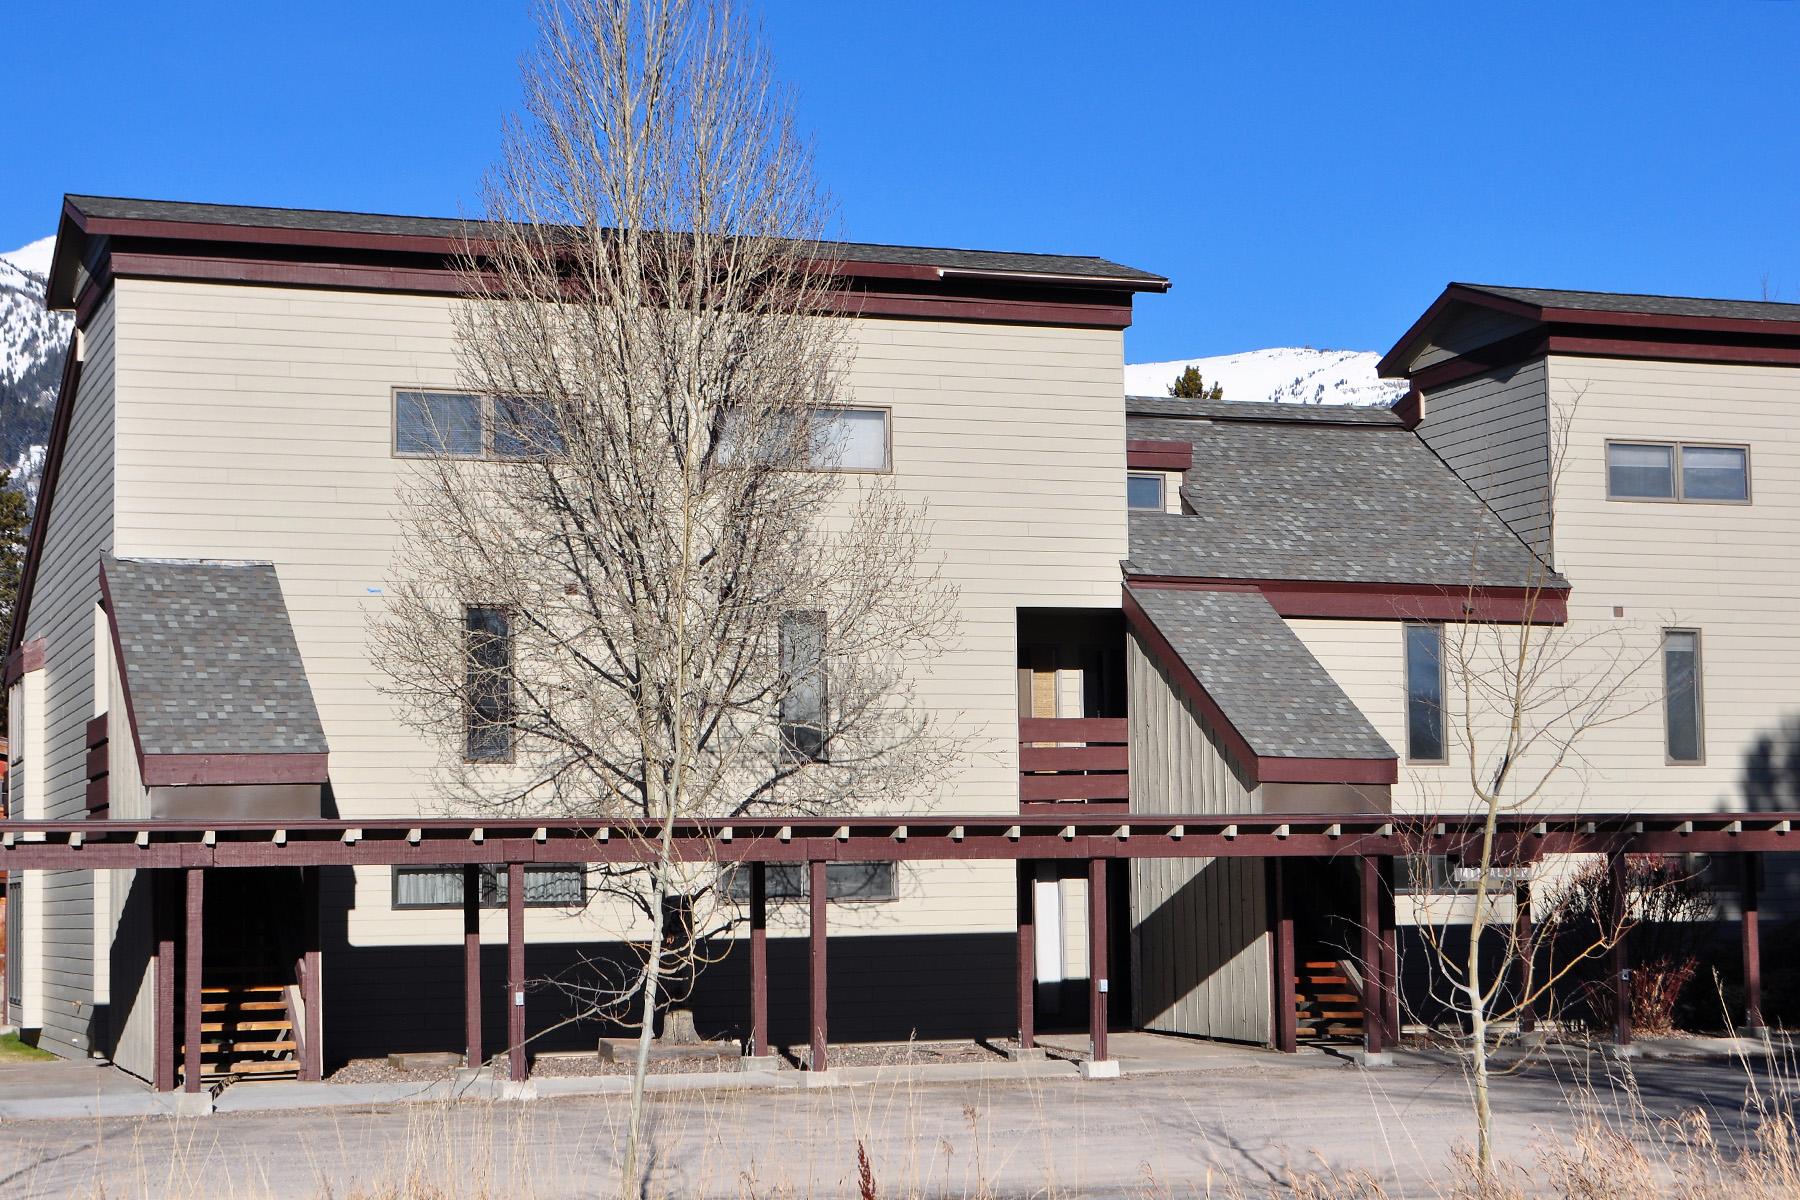 Кондоминиум для того Продажа на Ready for Update Aspens Two Bedroom 3685 North Teton Drive #823, Wilson, Вайоминг, 83014 Jackson Hole, Соединенные Штаты